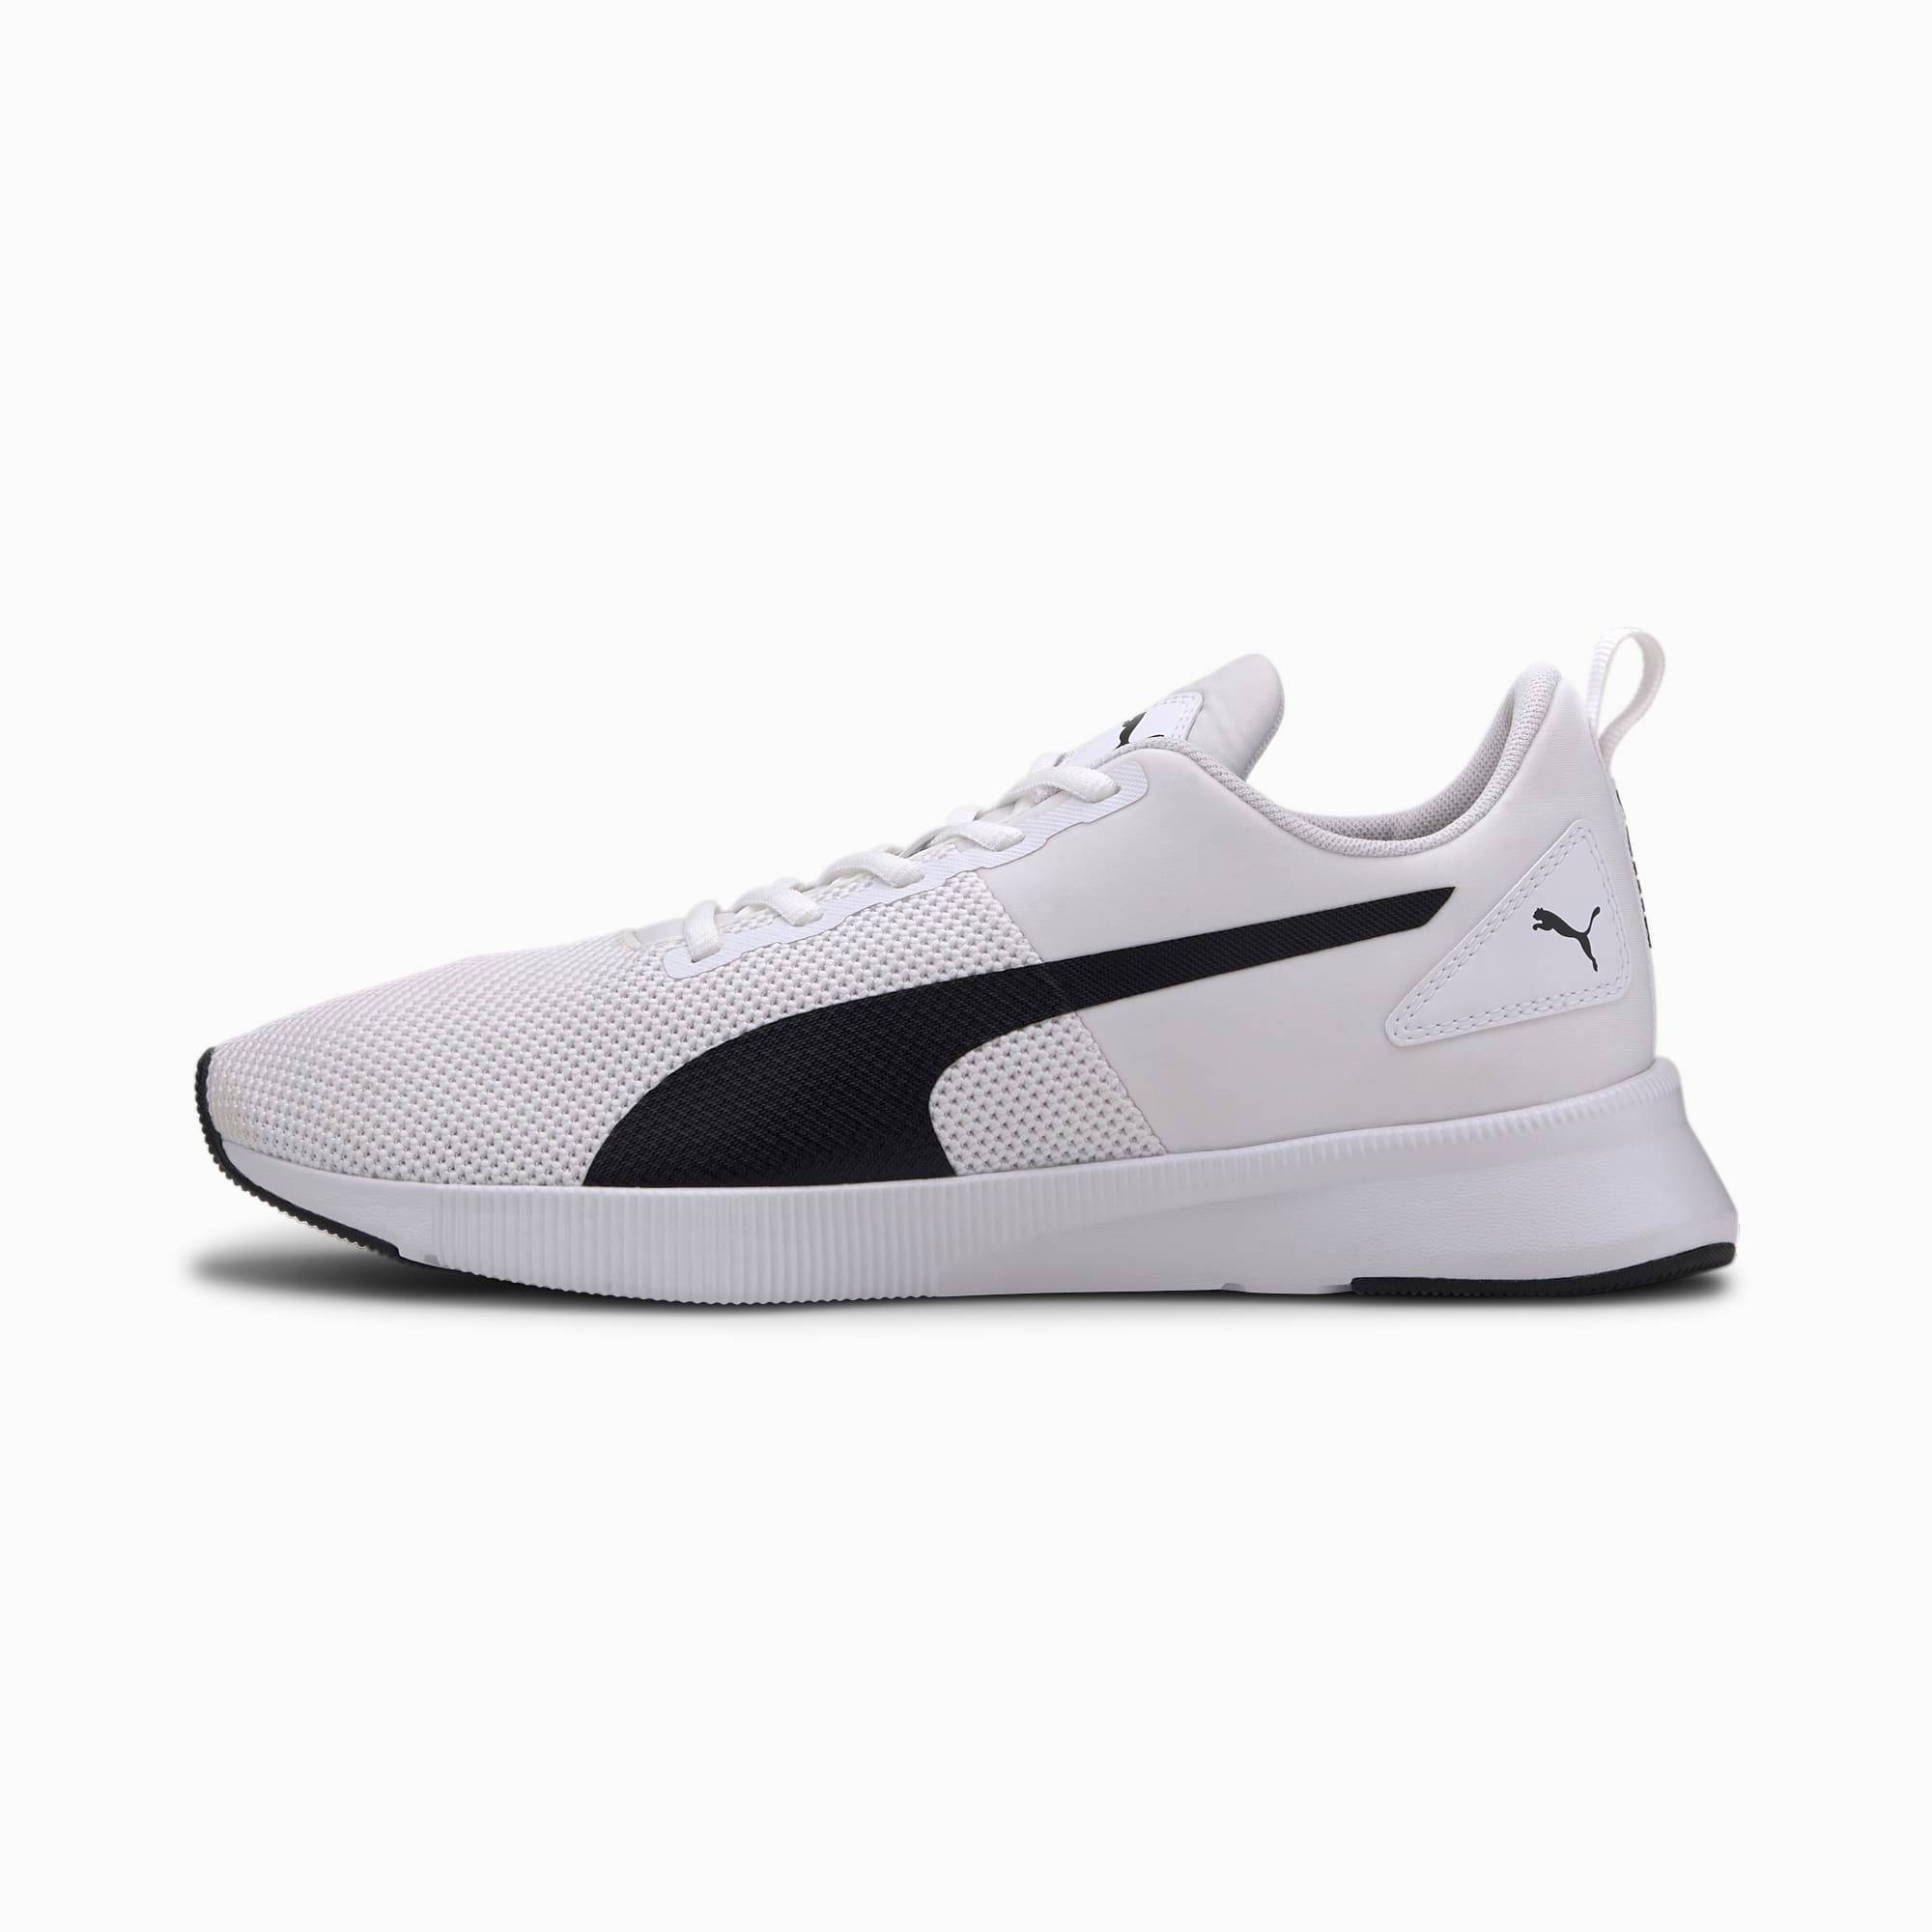 PUMA Chaussure de course Flyer Runner, Blanc/Noir, Taille 48.5, Chaussures